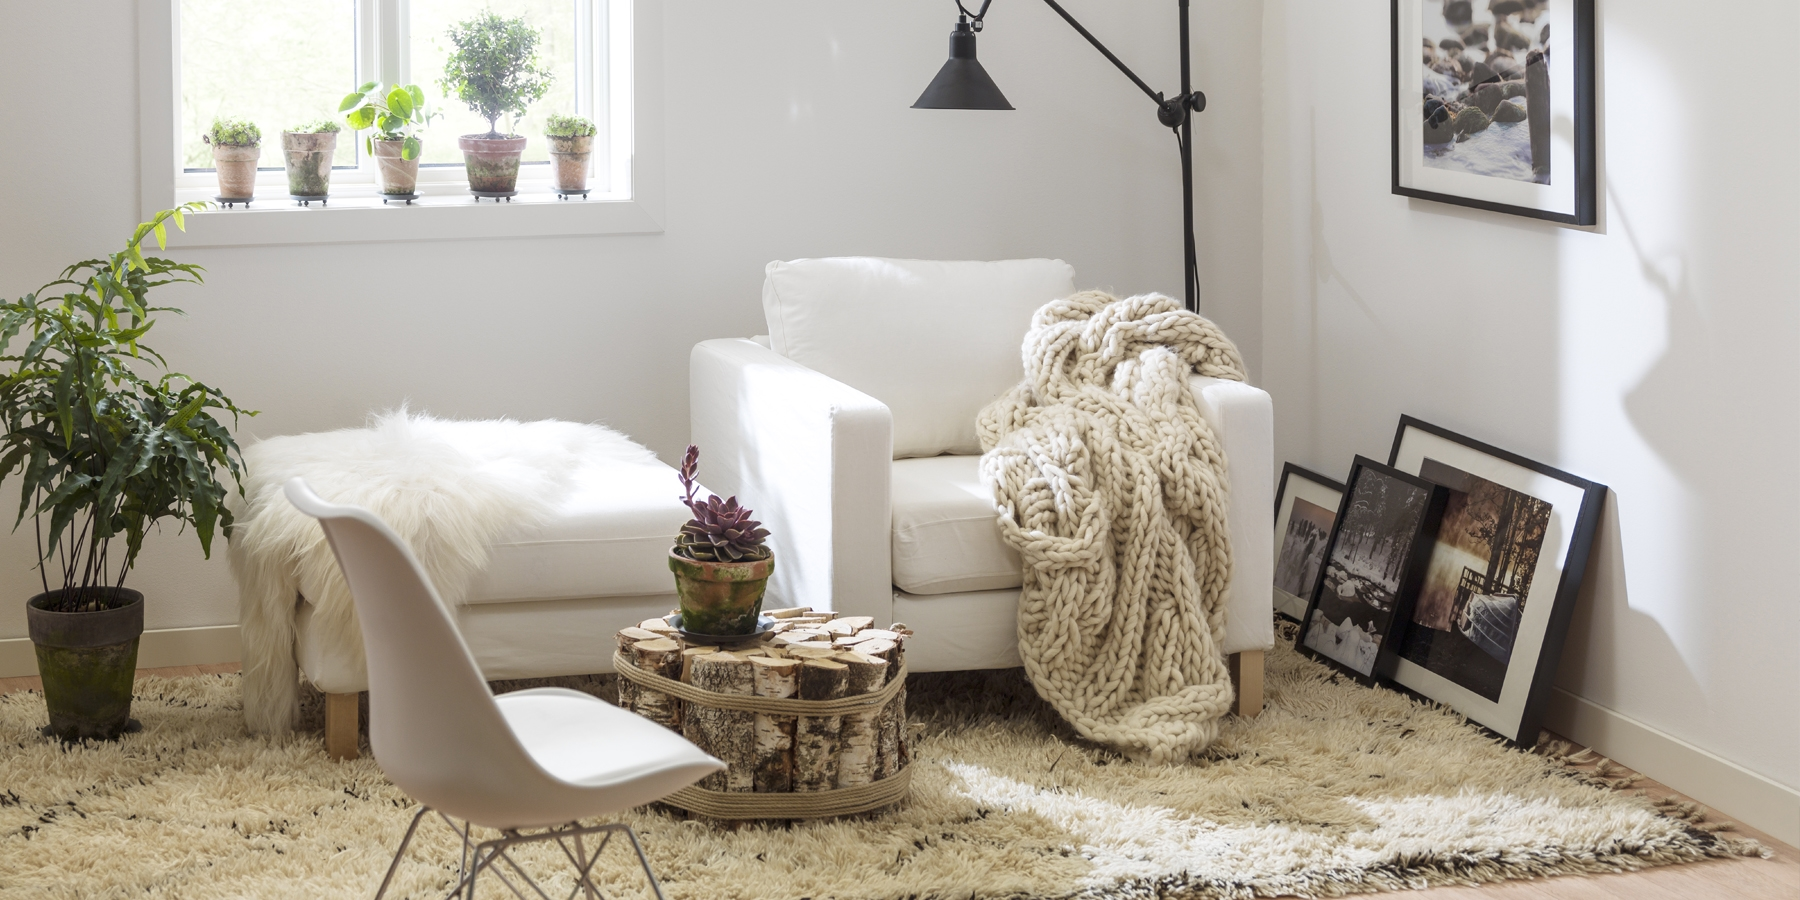 Rum med normalt slitage tex sovrum & vardagsrum